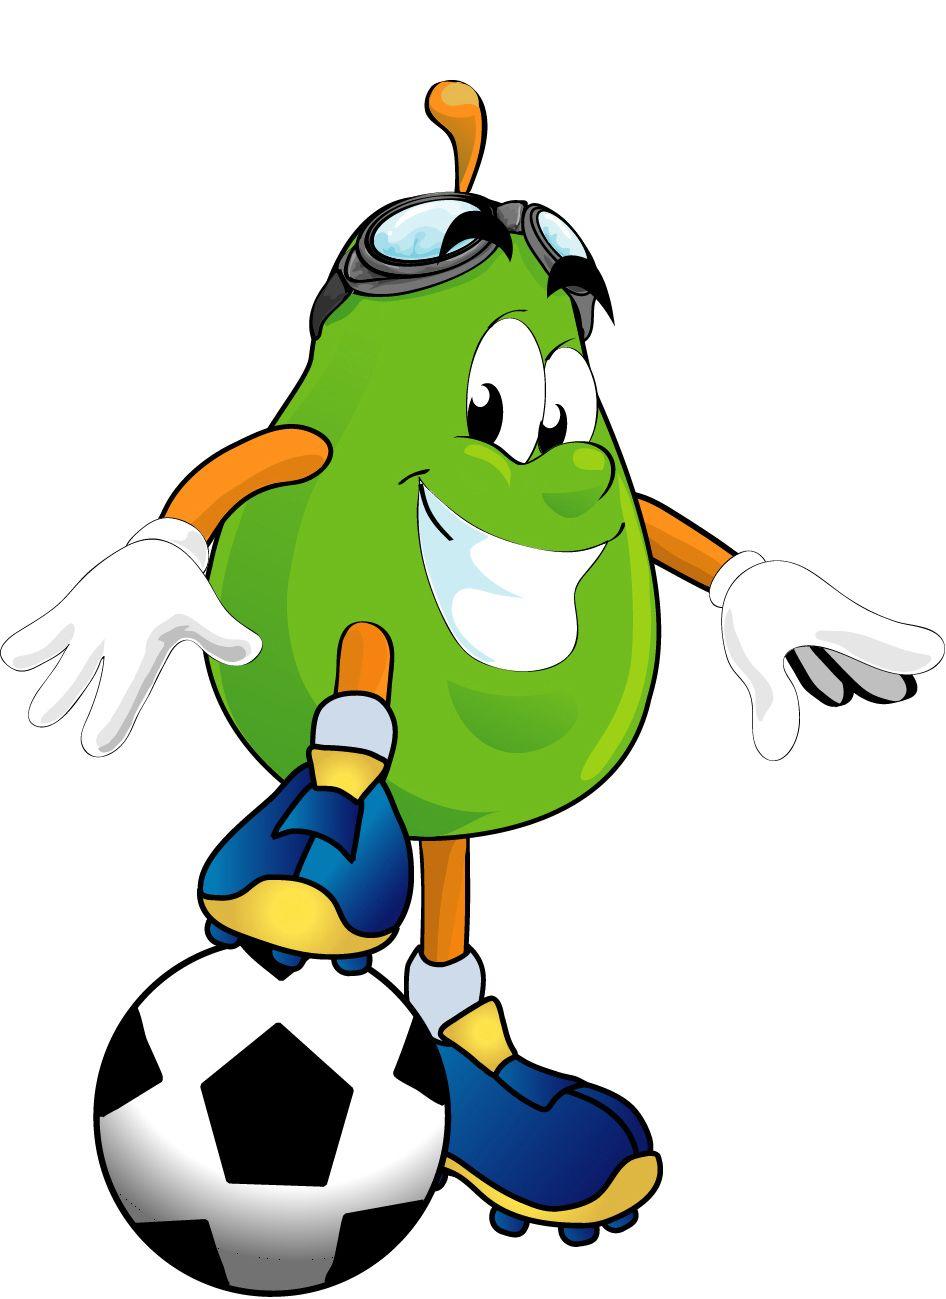 946x1299 Image For Pear Playing Football Health Clip Art Health Clip Art